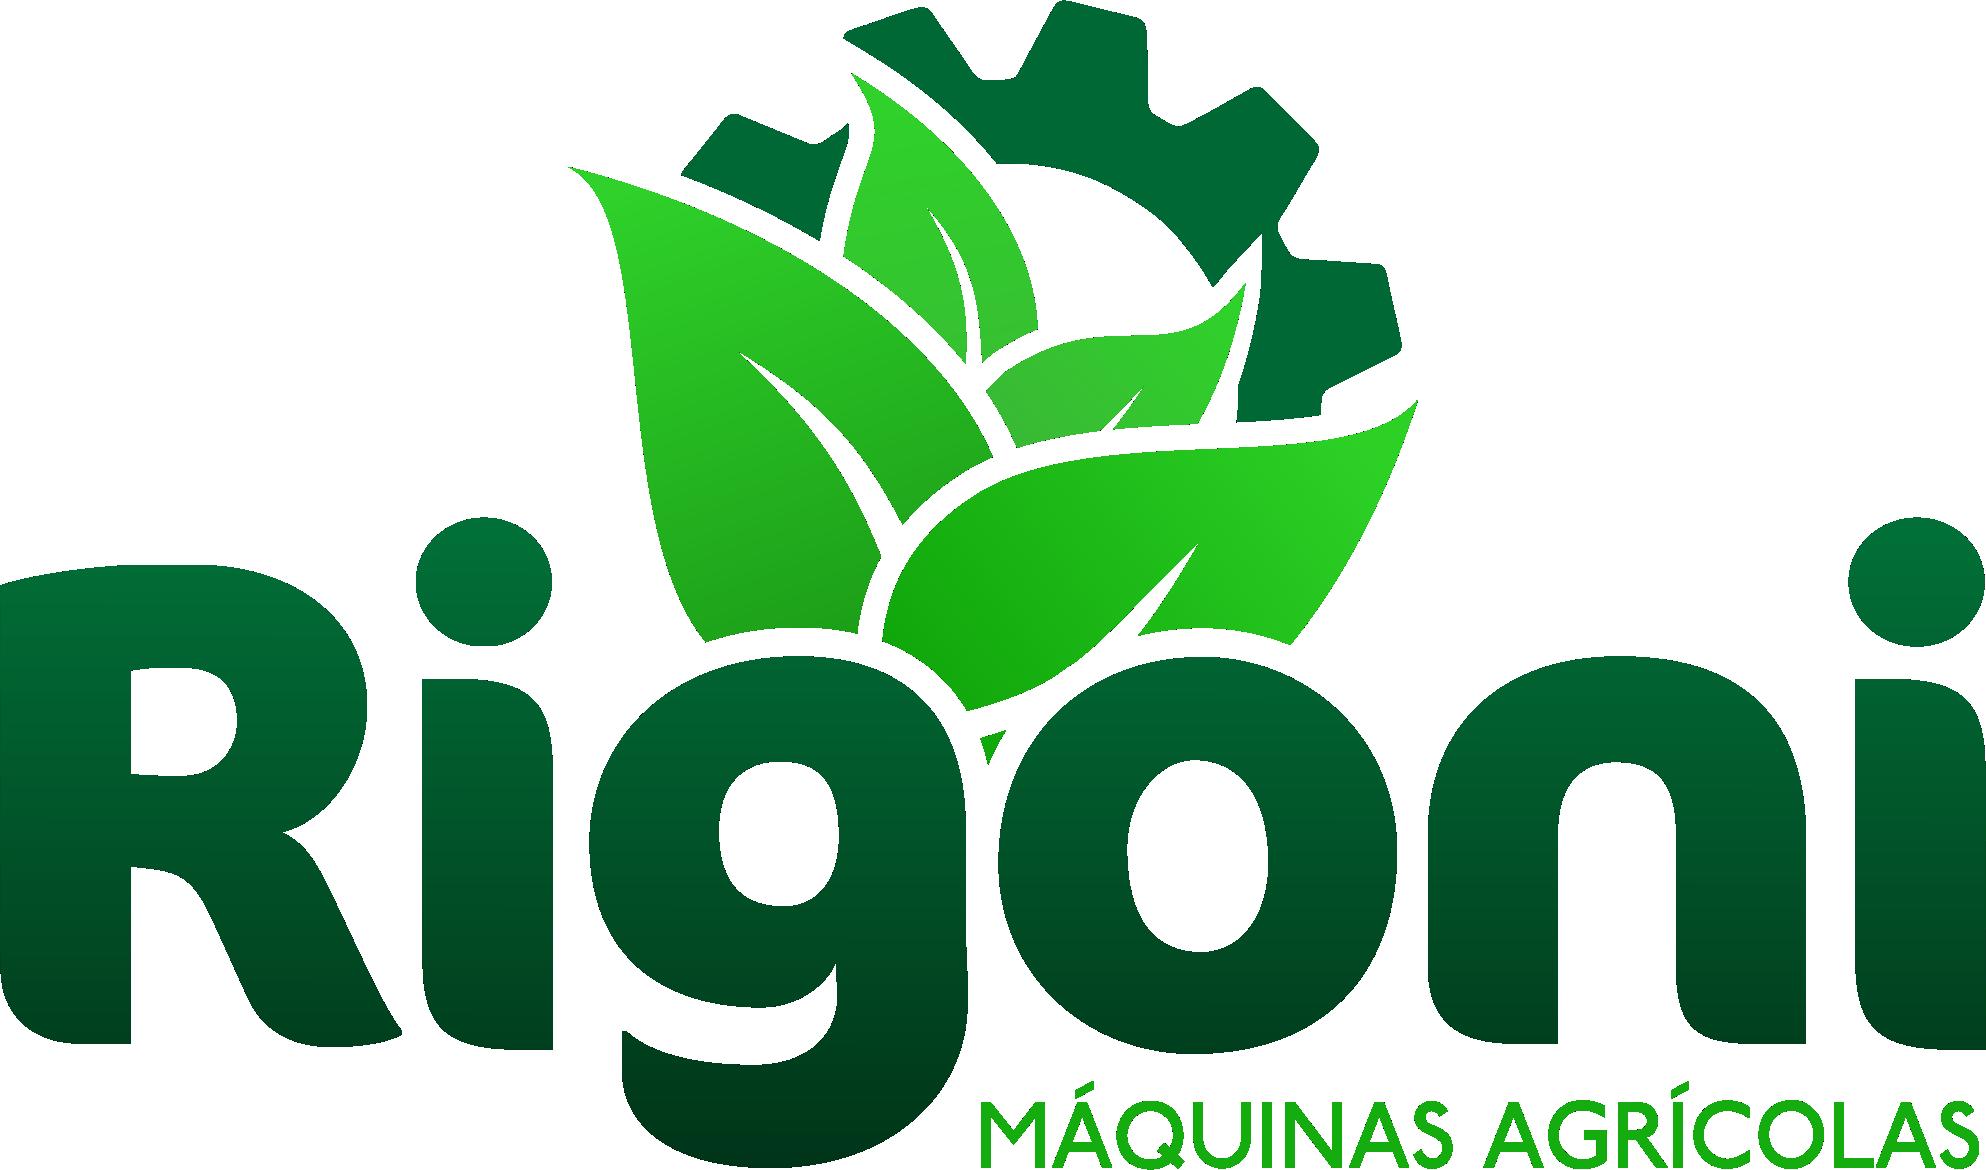 Rigoni Máquinas Agrícolas